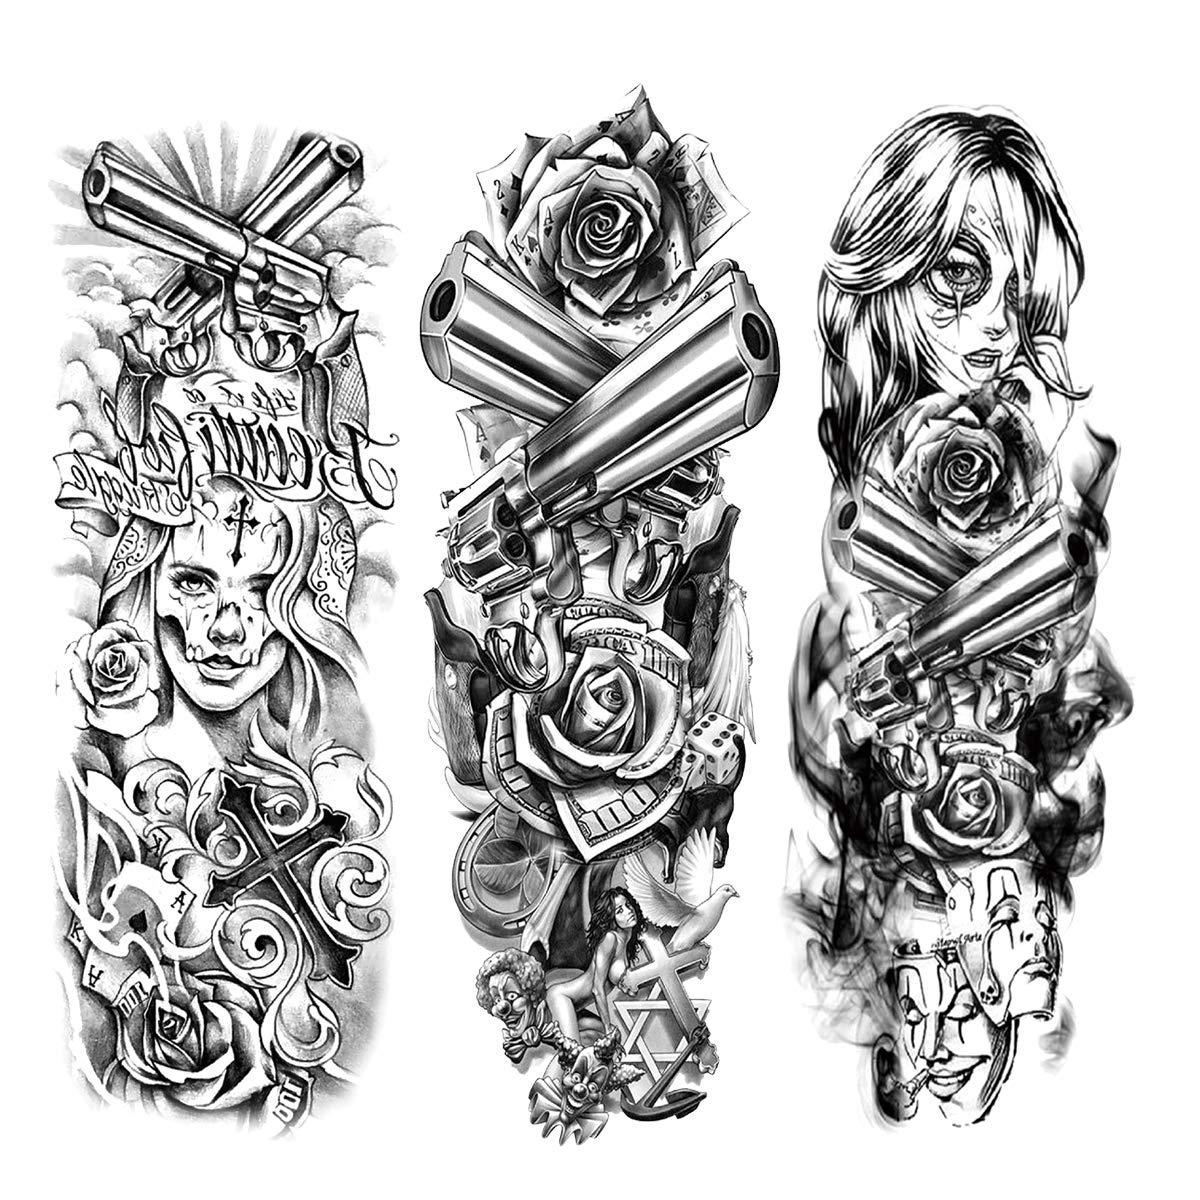 12 PCS Full Arm Temporary Tattoo Stickers, Waterproof Temporary Tattoo, Black Body Tattoo Stickers For Women, Men, Halloween, Party, Masquerade